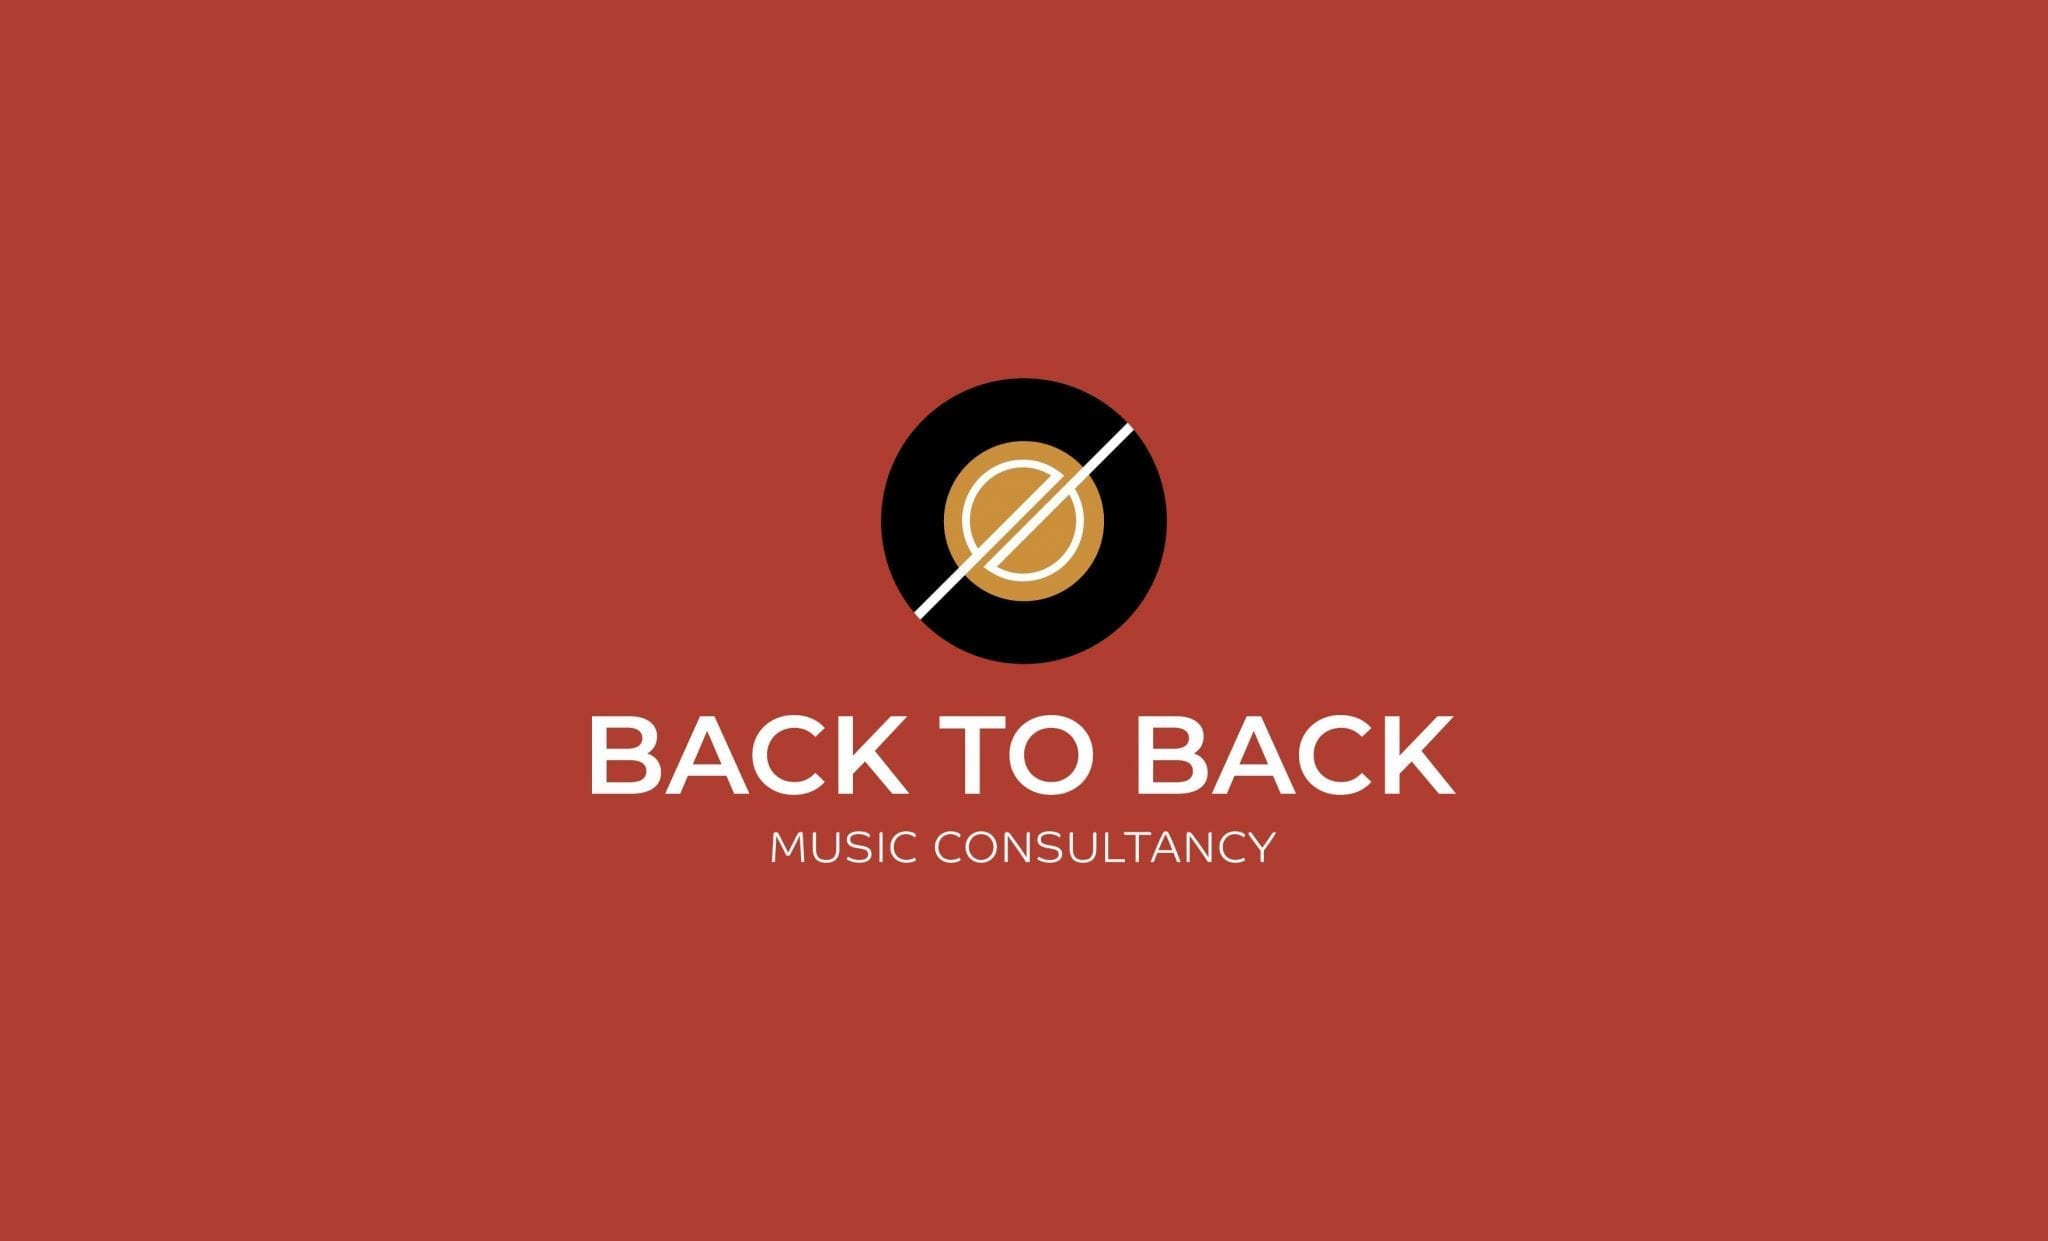 Back to Back Branding Guidelines4